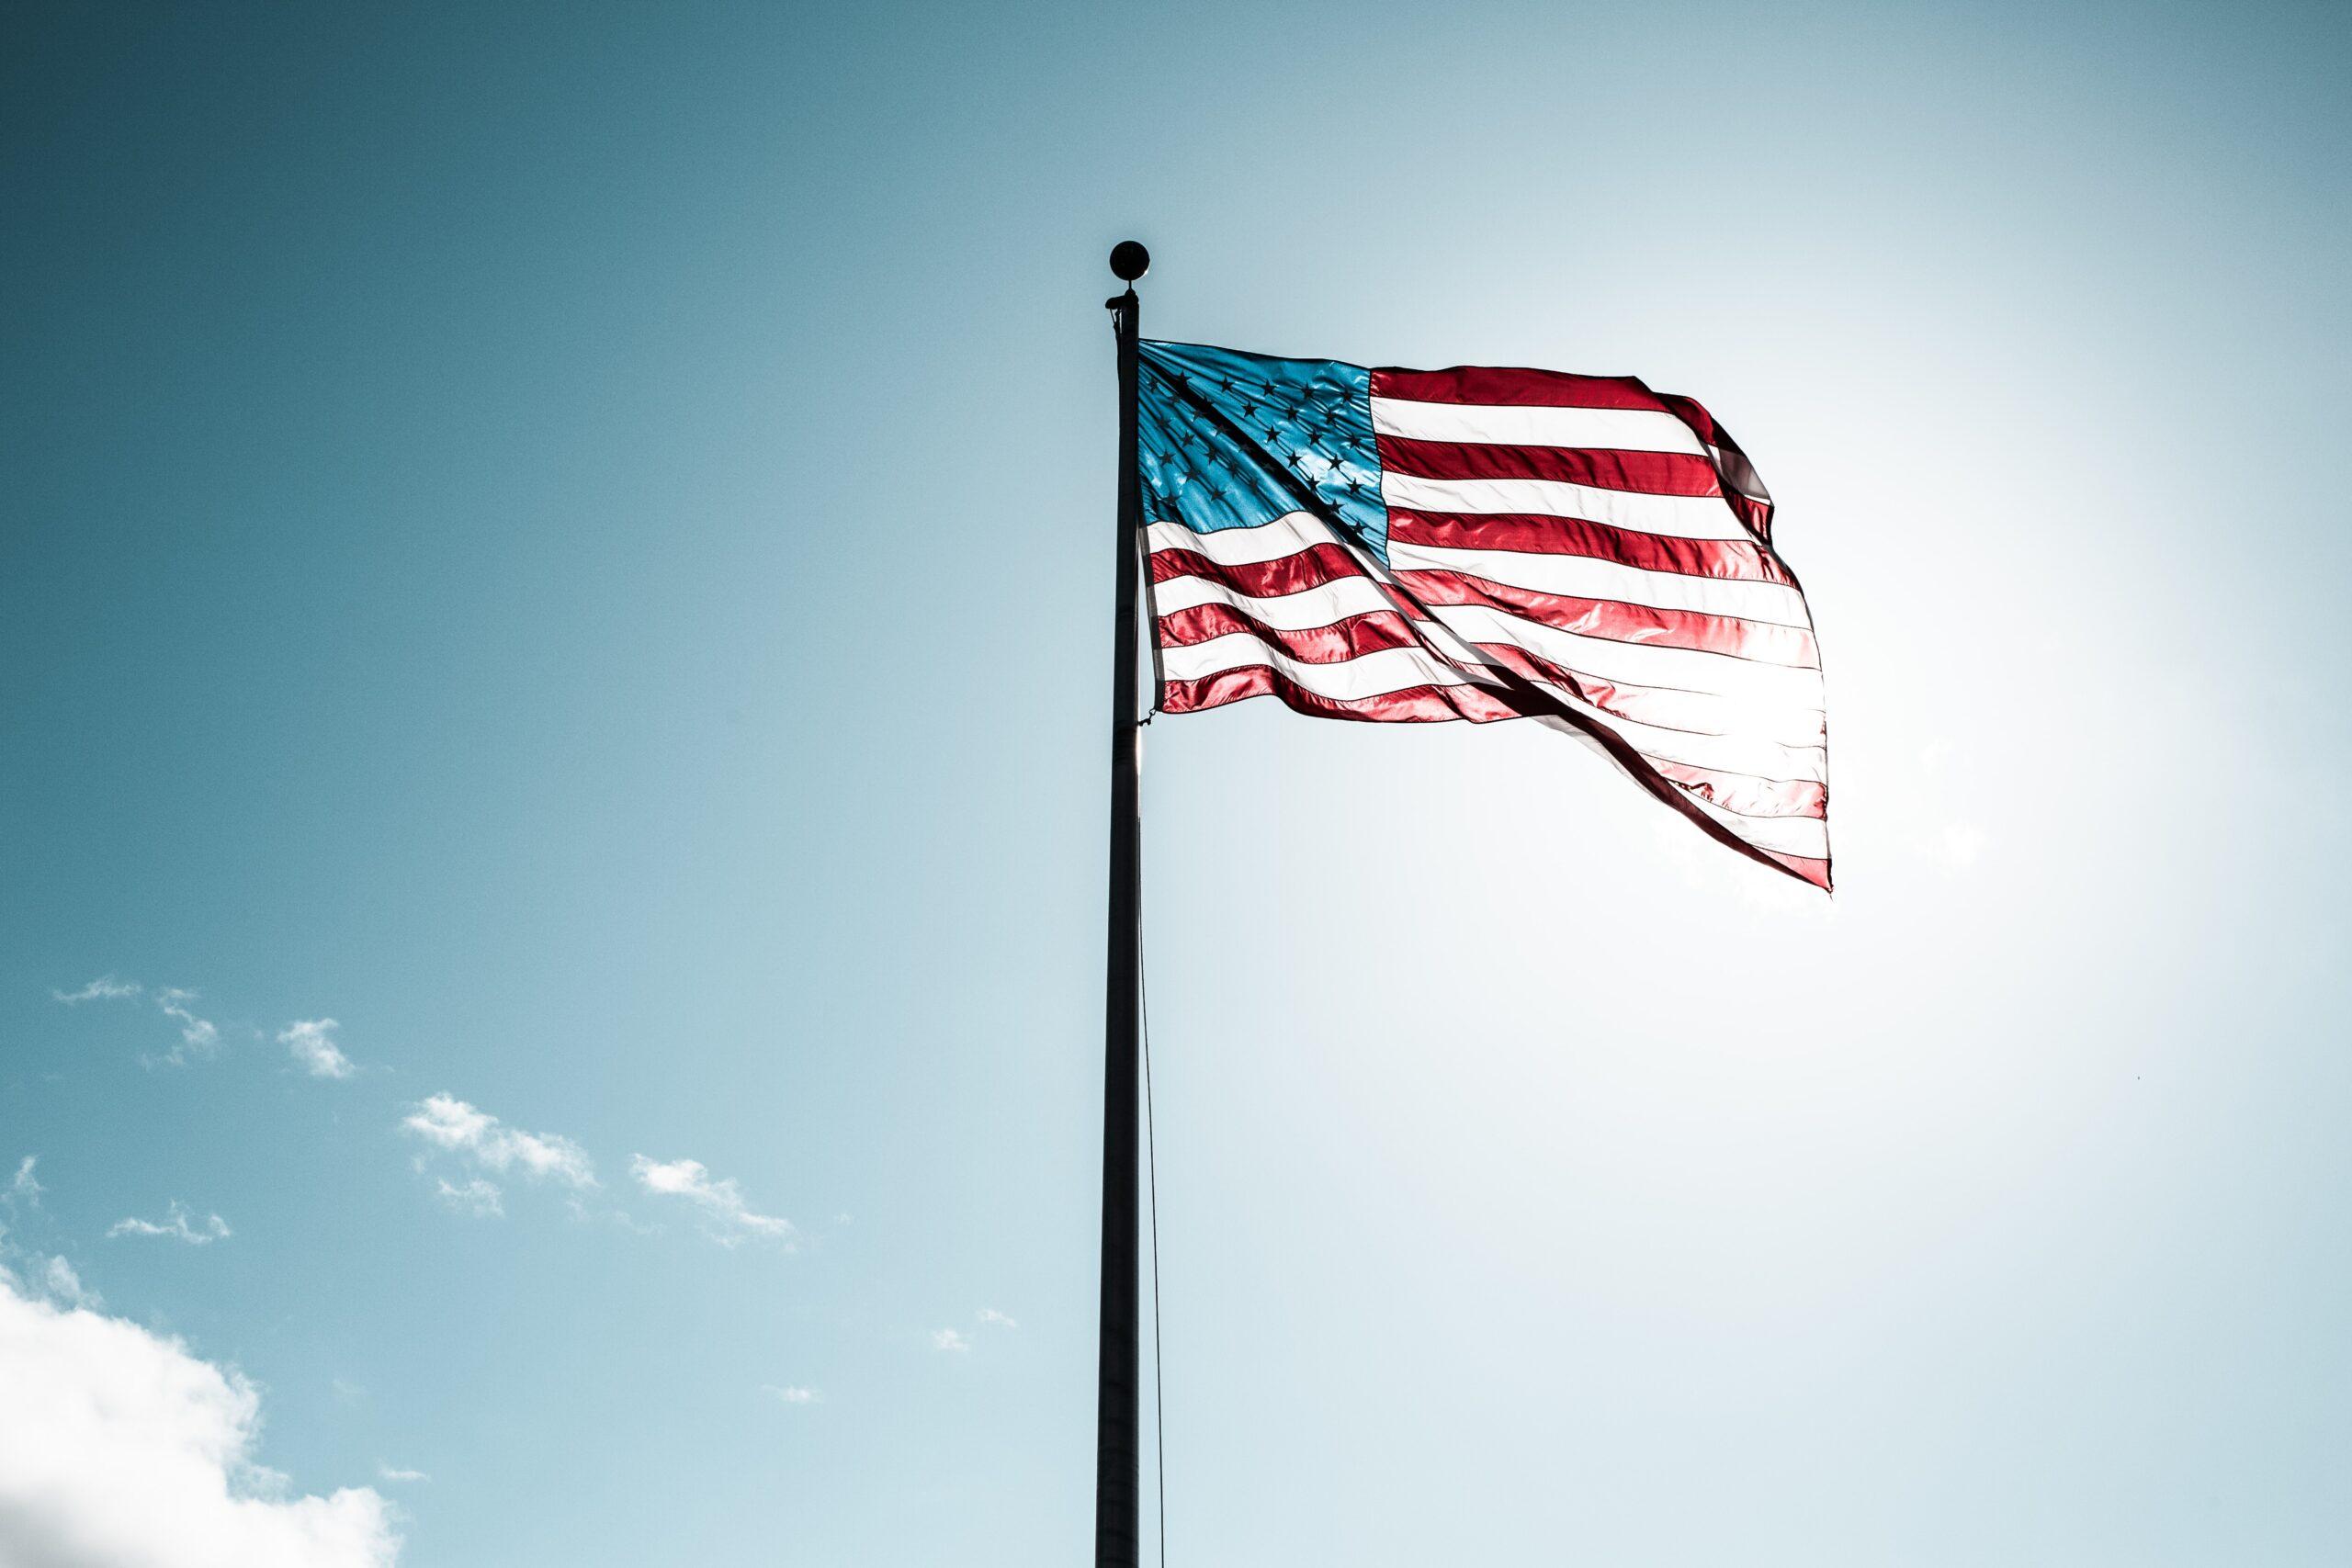 Flag of U.S.A. Image credit: Justin Cron, Unsplash